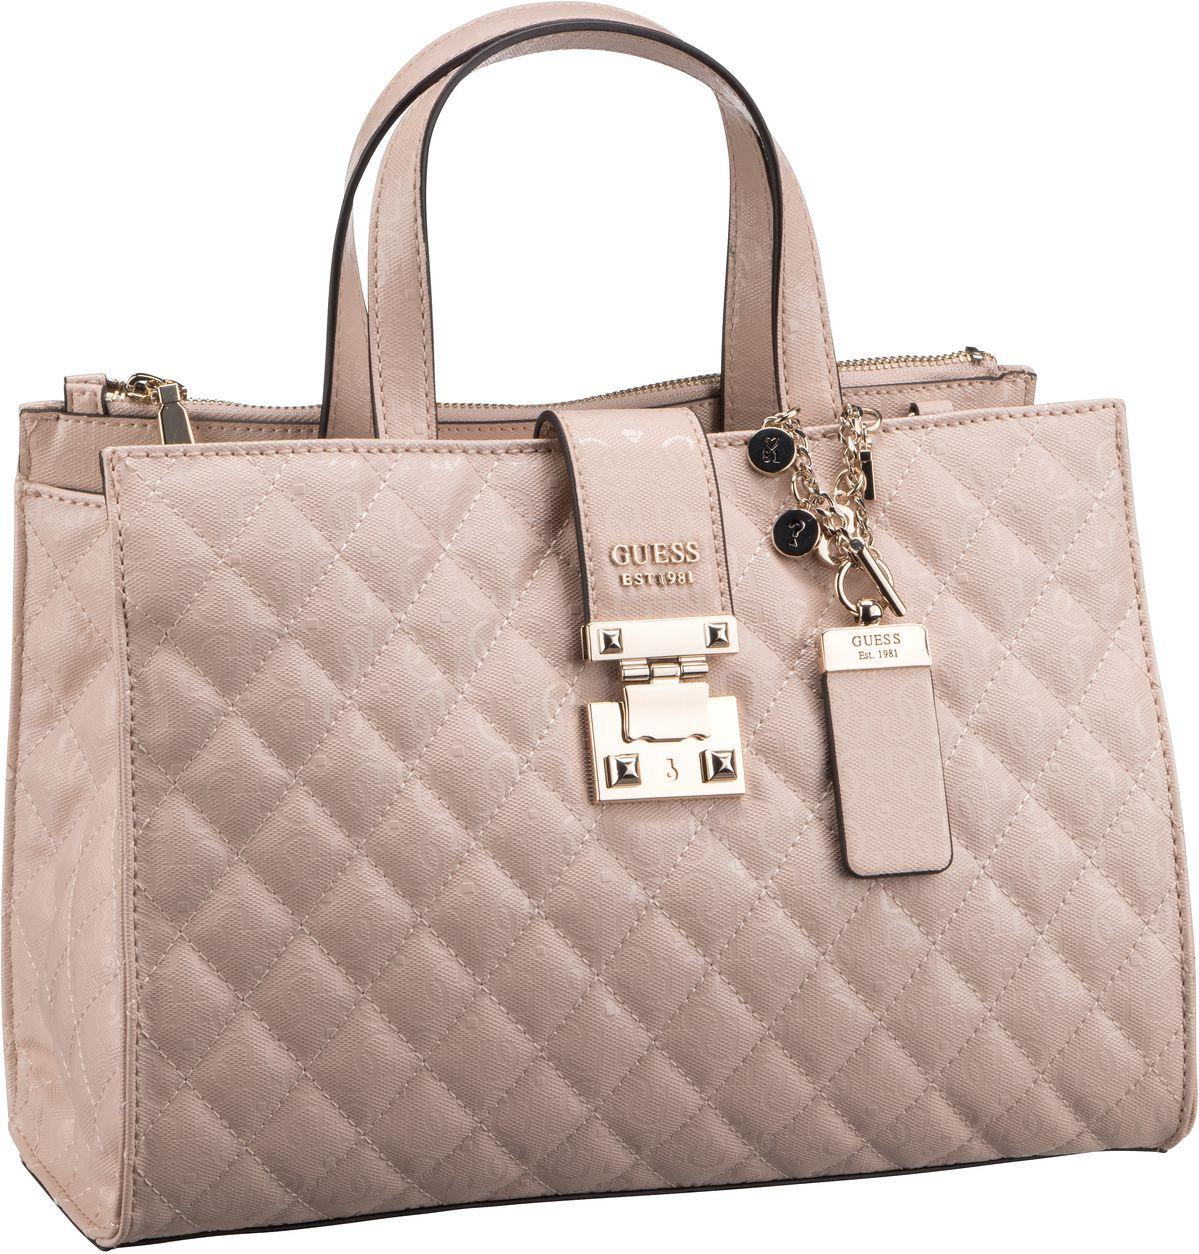 Handtasche Tiggy Society Satchel Blush